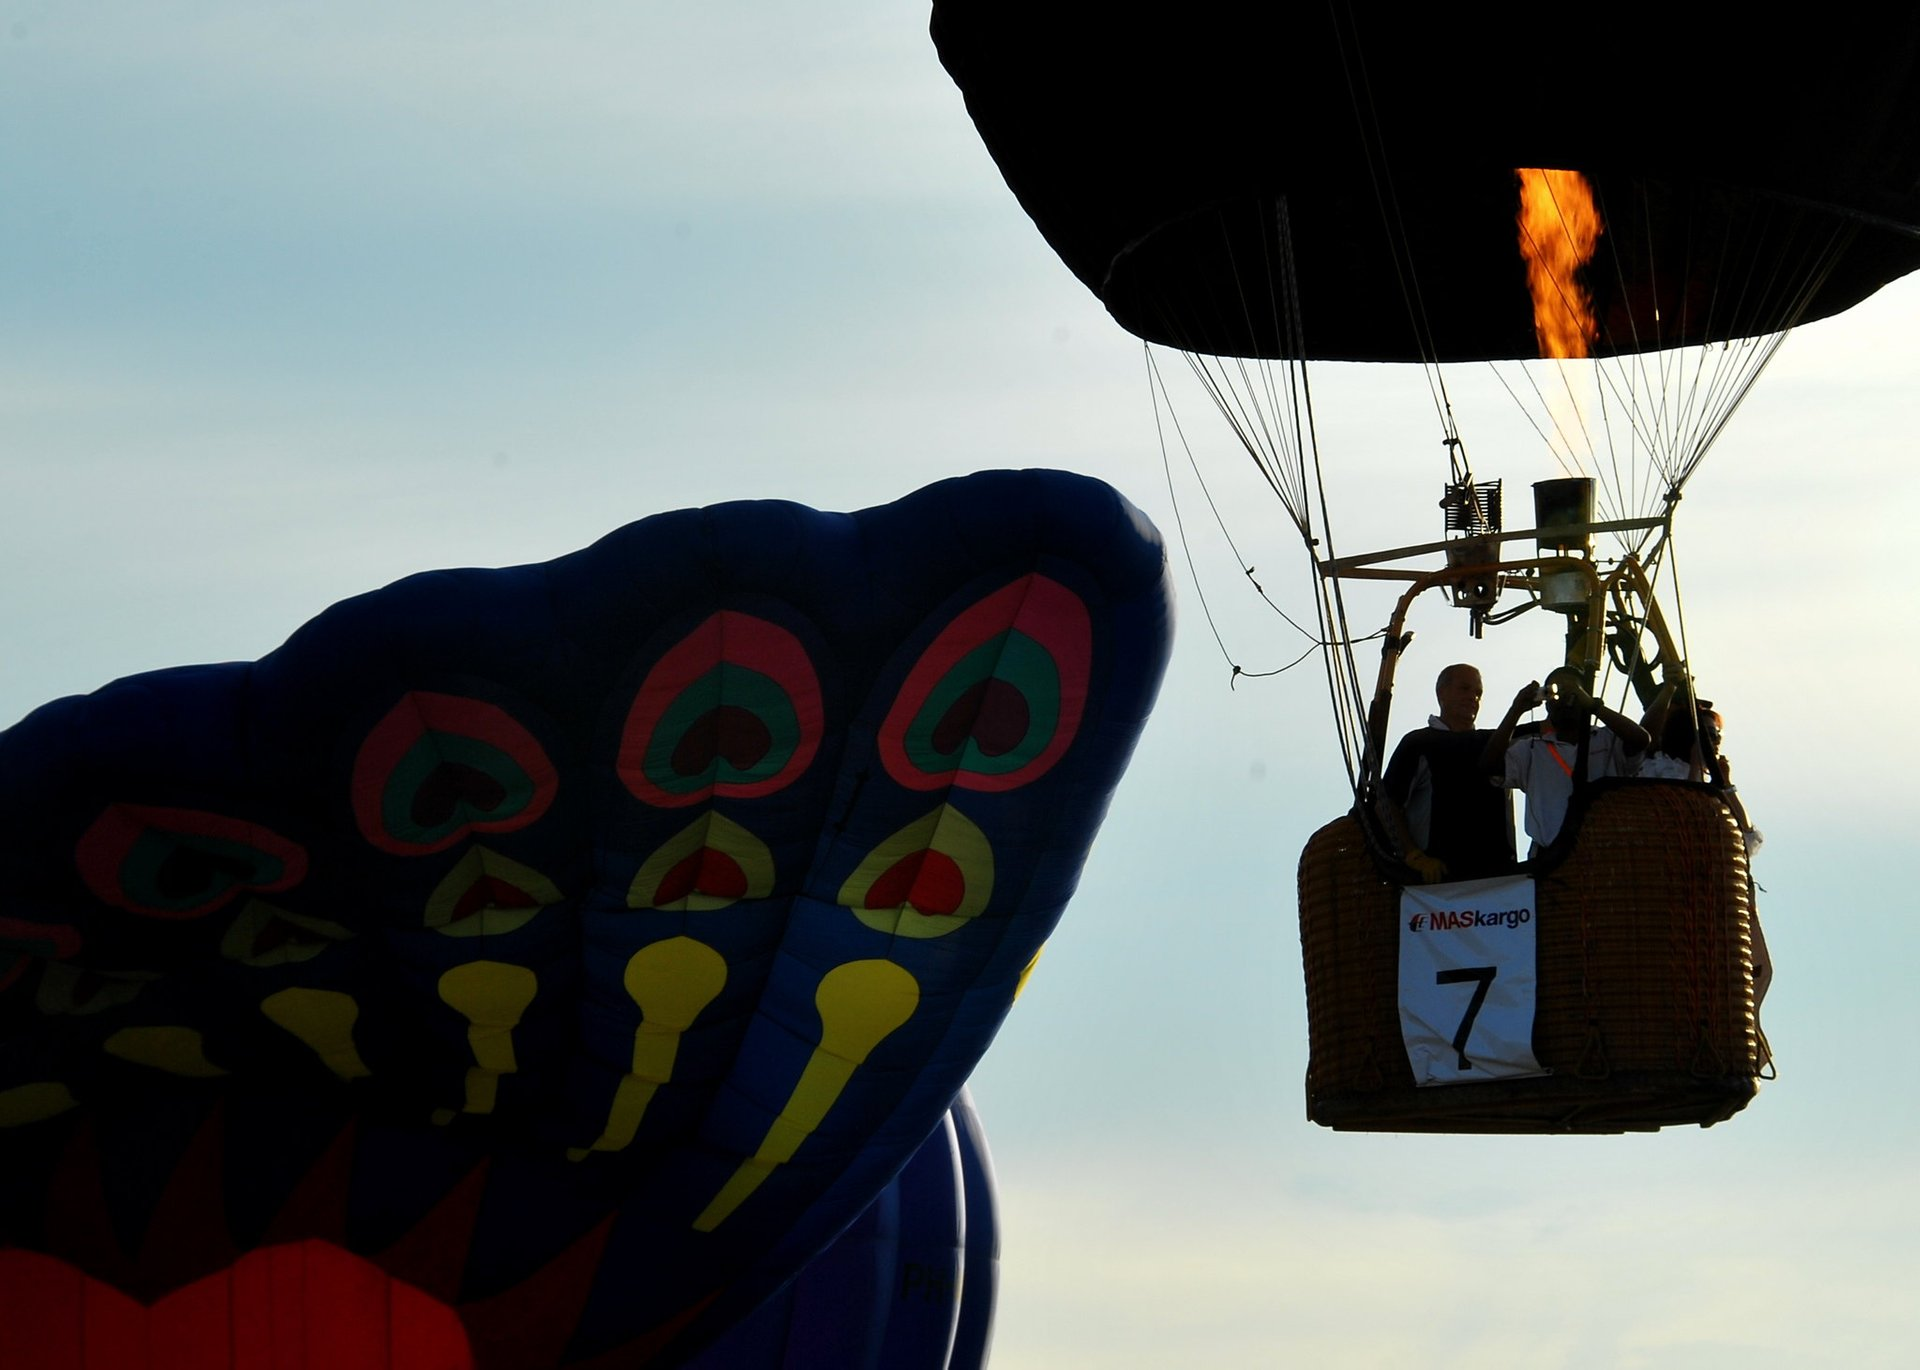 Best time for Putrajaya International Hot Air Balloon Fiesta in Kuala Lumpur 2020